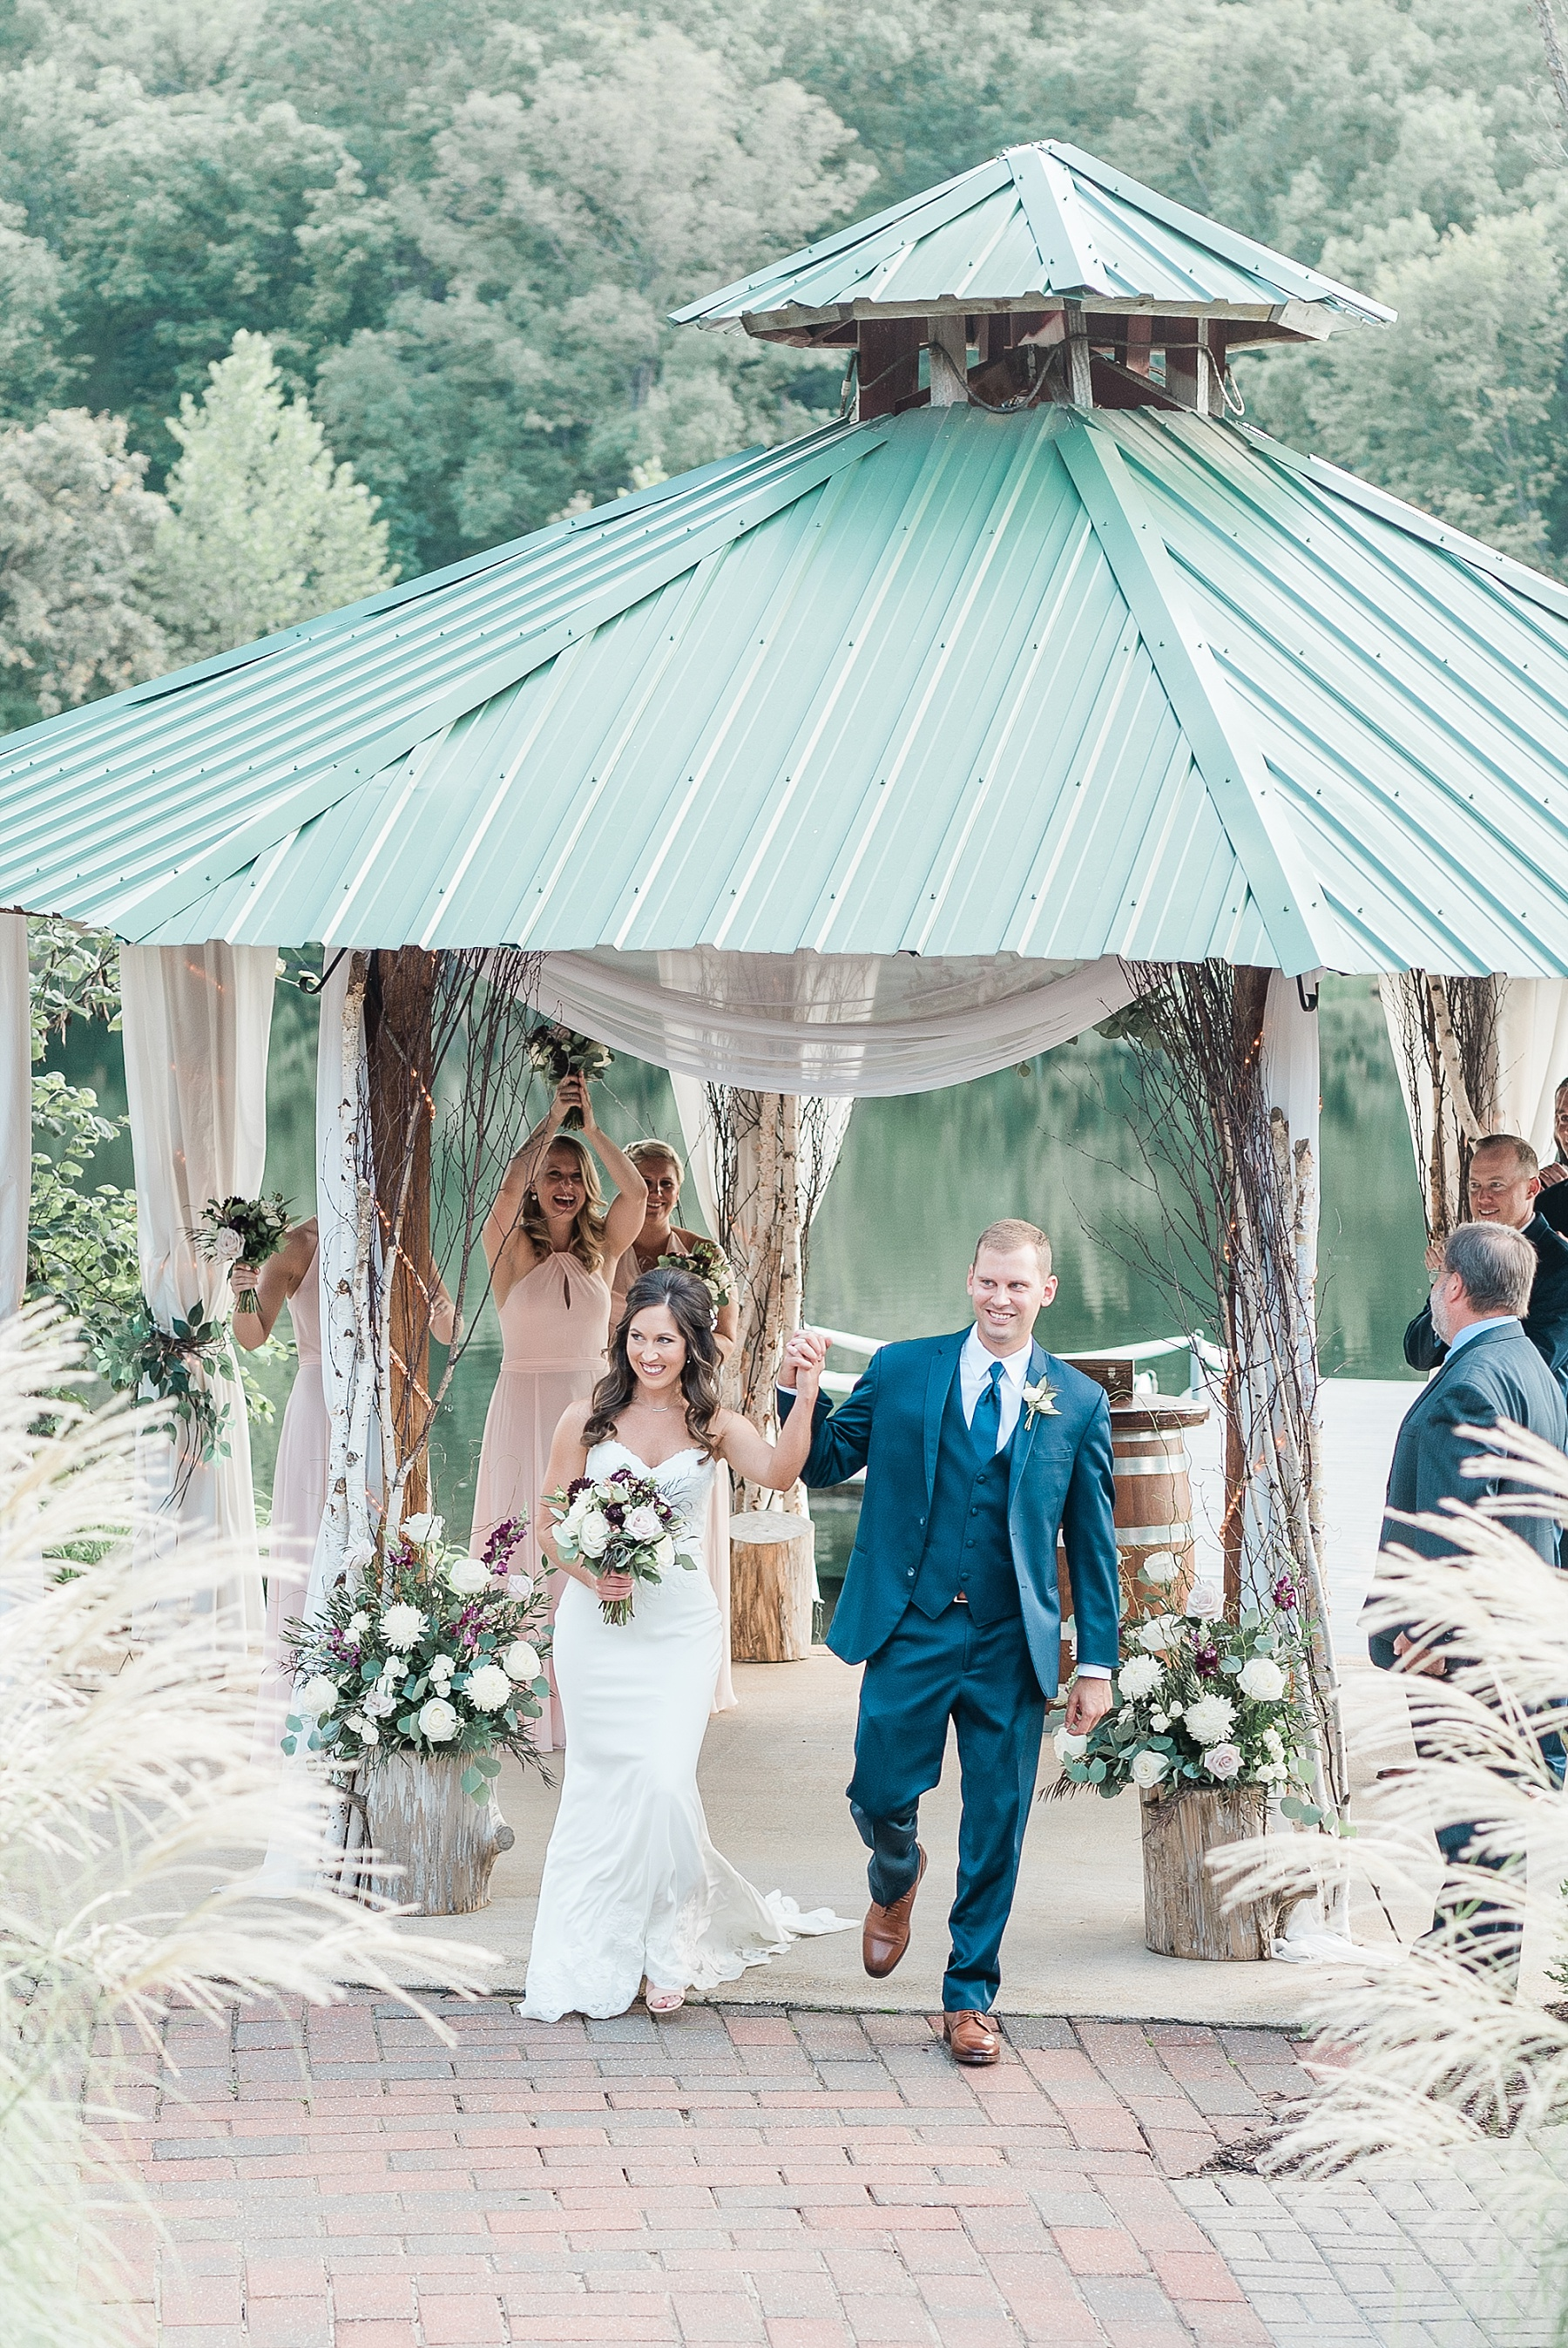 Romantic Summer Sunset Wedding Ceremony at Little Piney Lodge St. Louis Missouri by Kelsi Kliethermes Photography Fine Art Photographer_0059.jpg